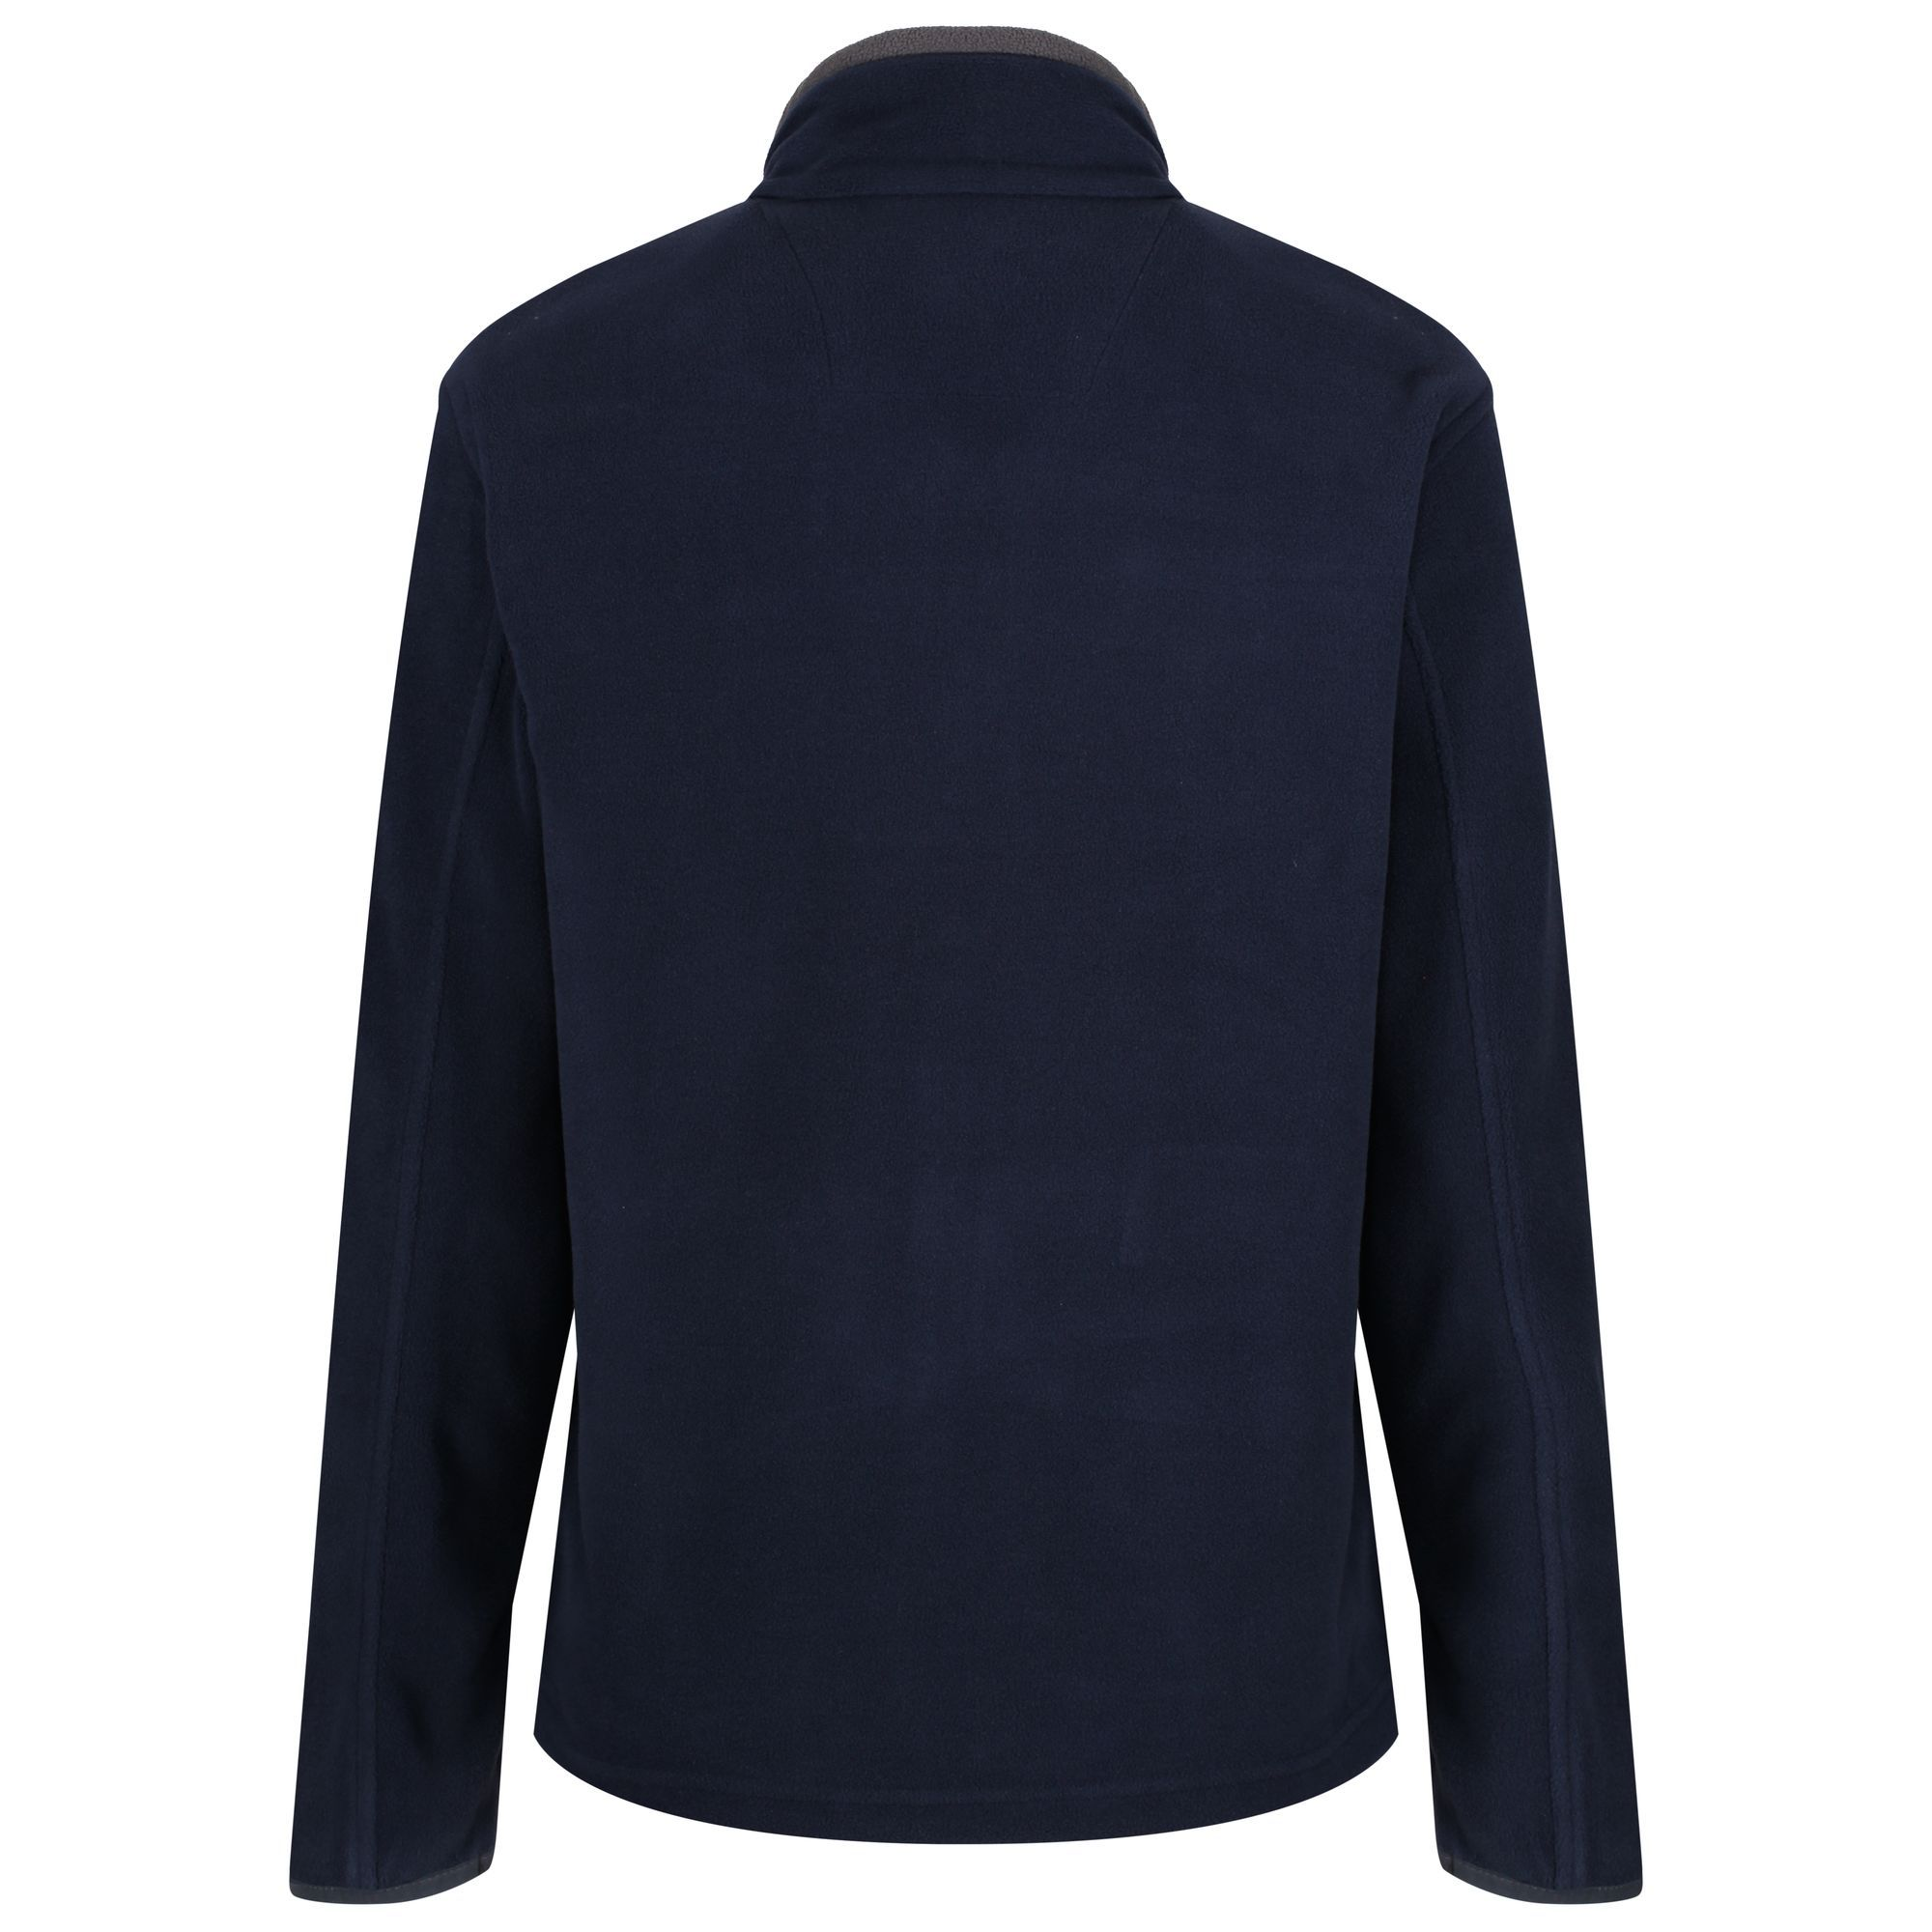 thumbnail 14 - Regatta Fellard Mens Lightweight Full Zip Warm Walking Fleece Jacket RRP £30